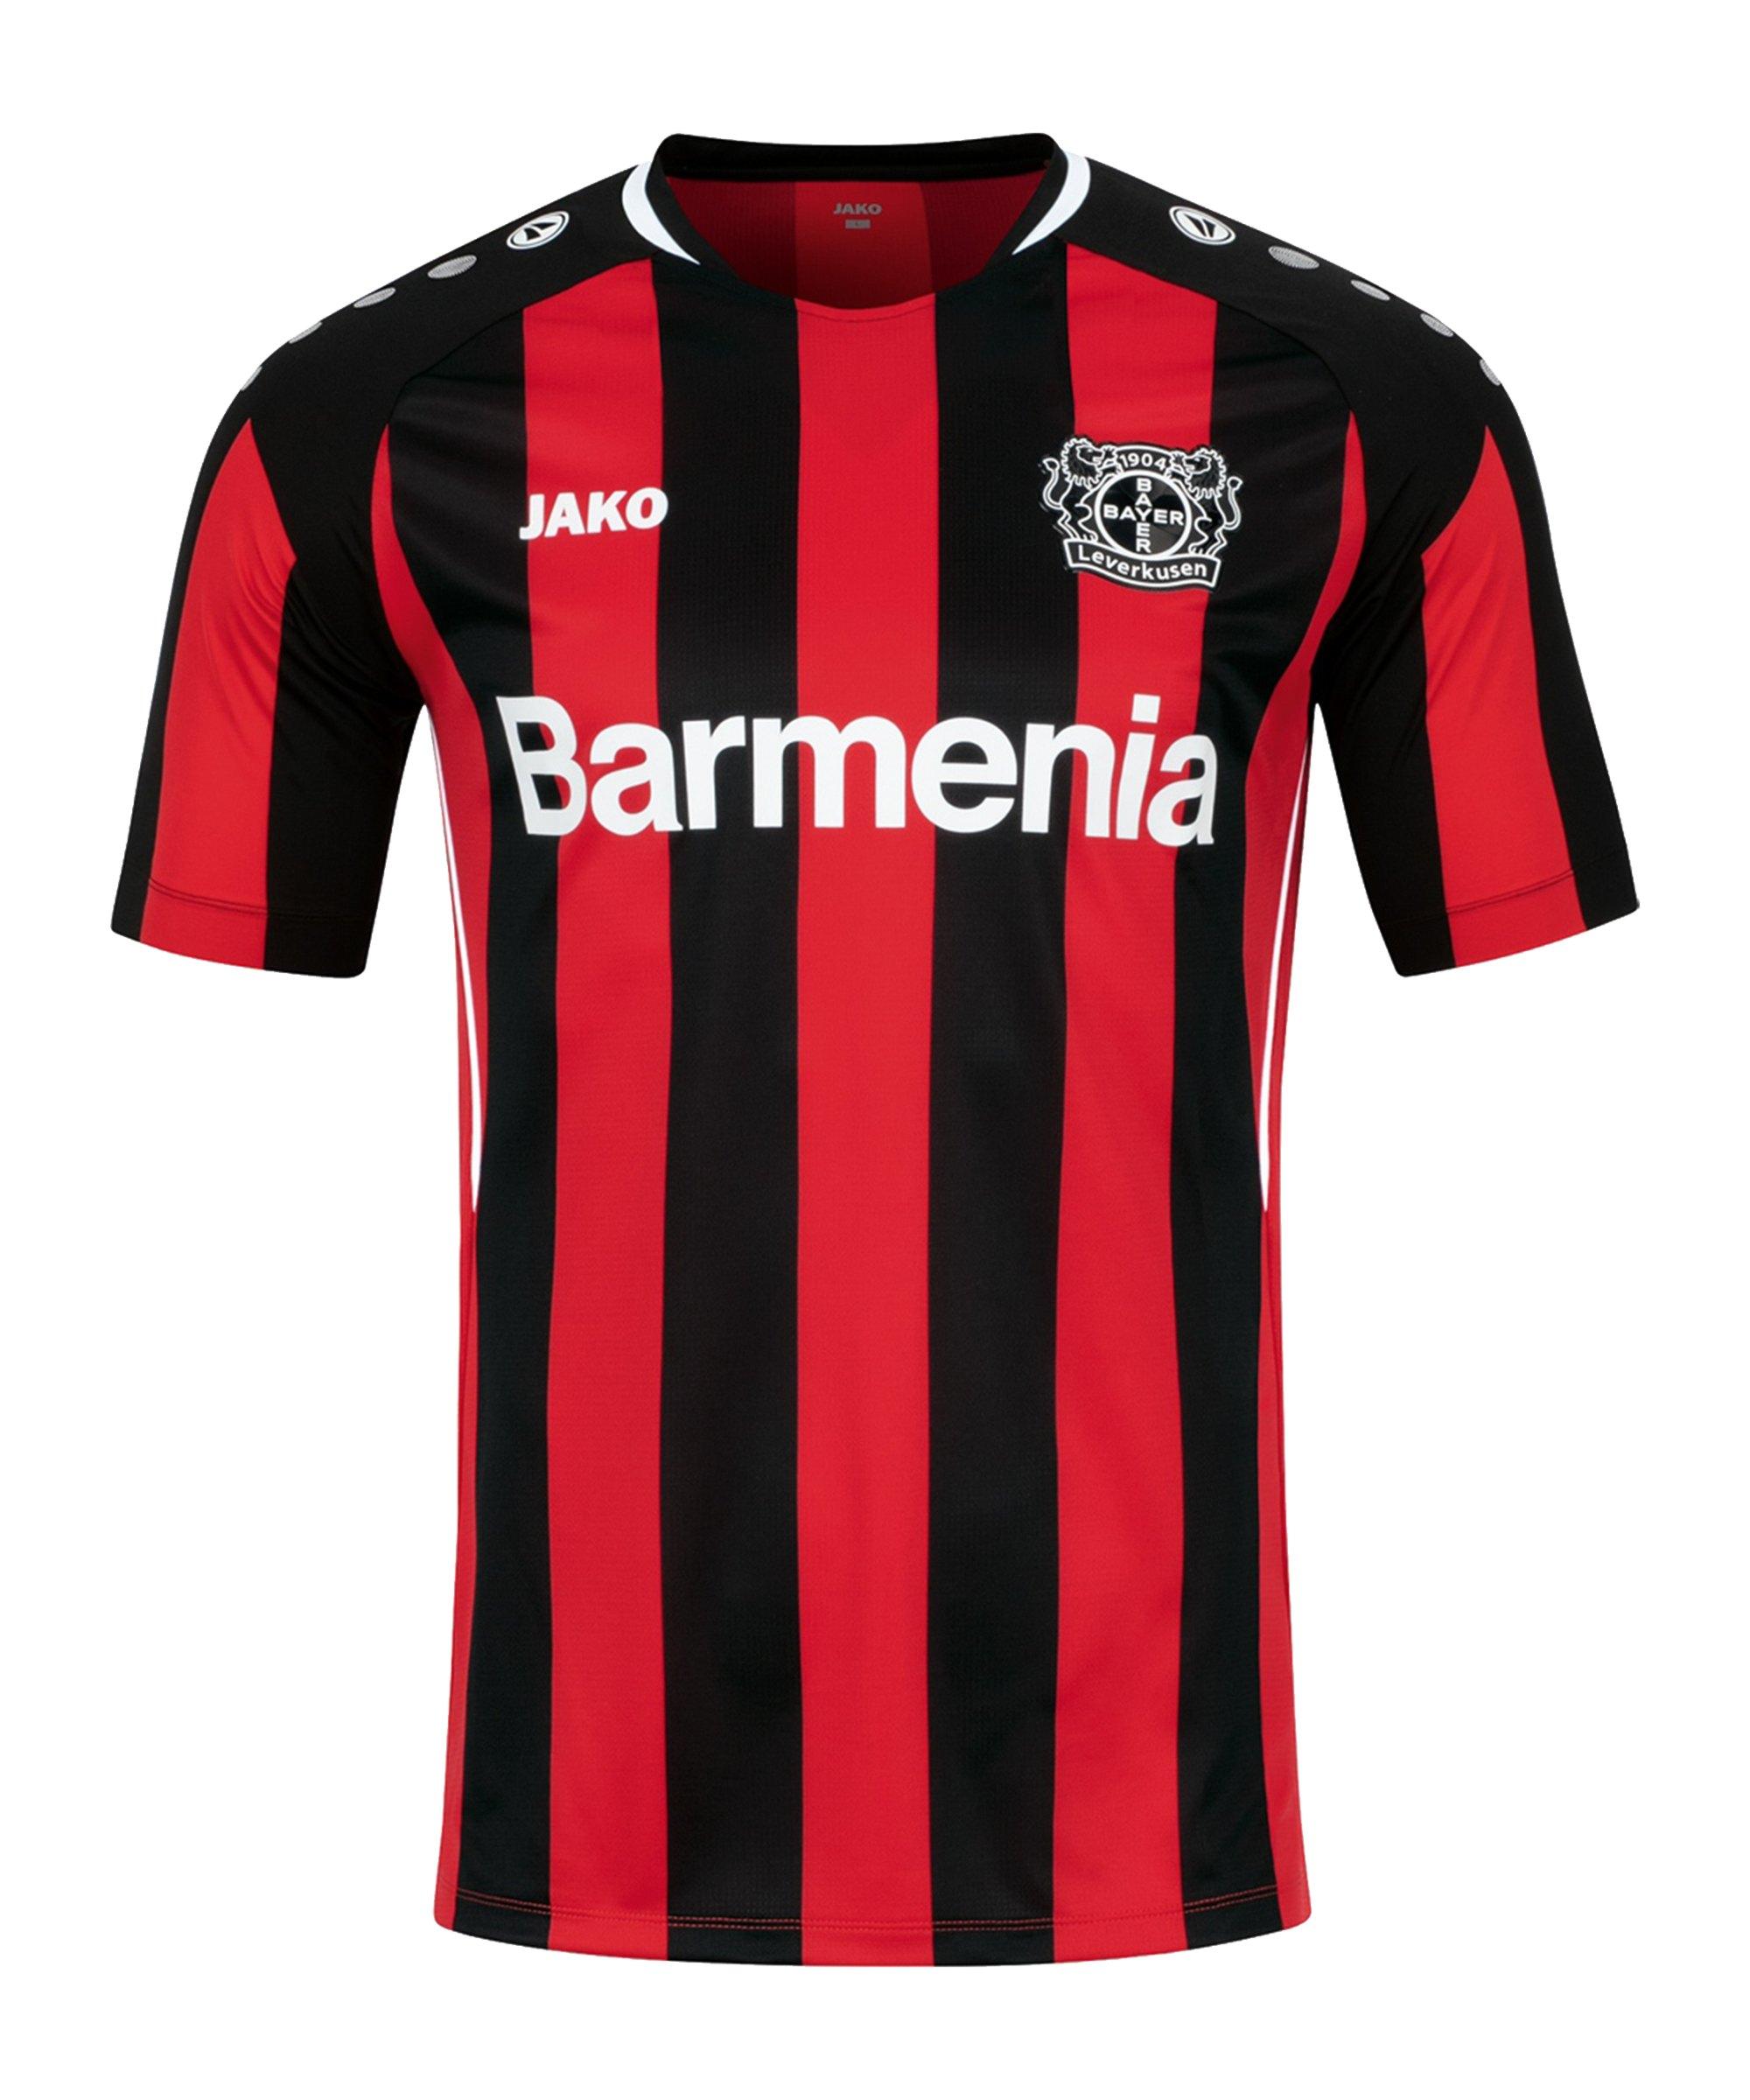 JAKO Bayer 04 Leverkusen Trikot Home 2021/2022 Schwarz Rot F681 - schwarz